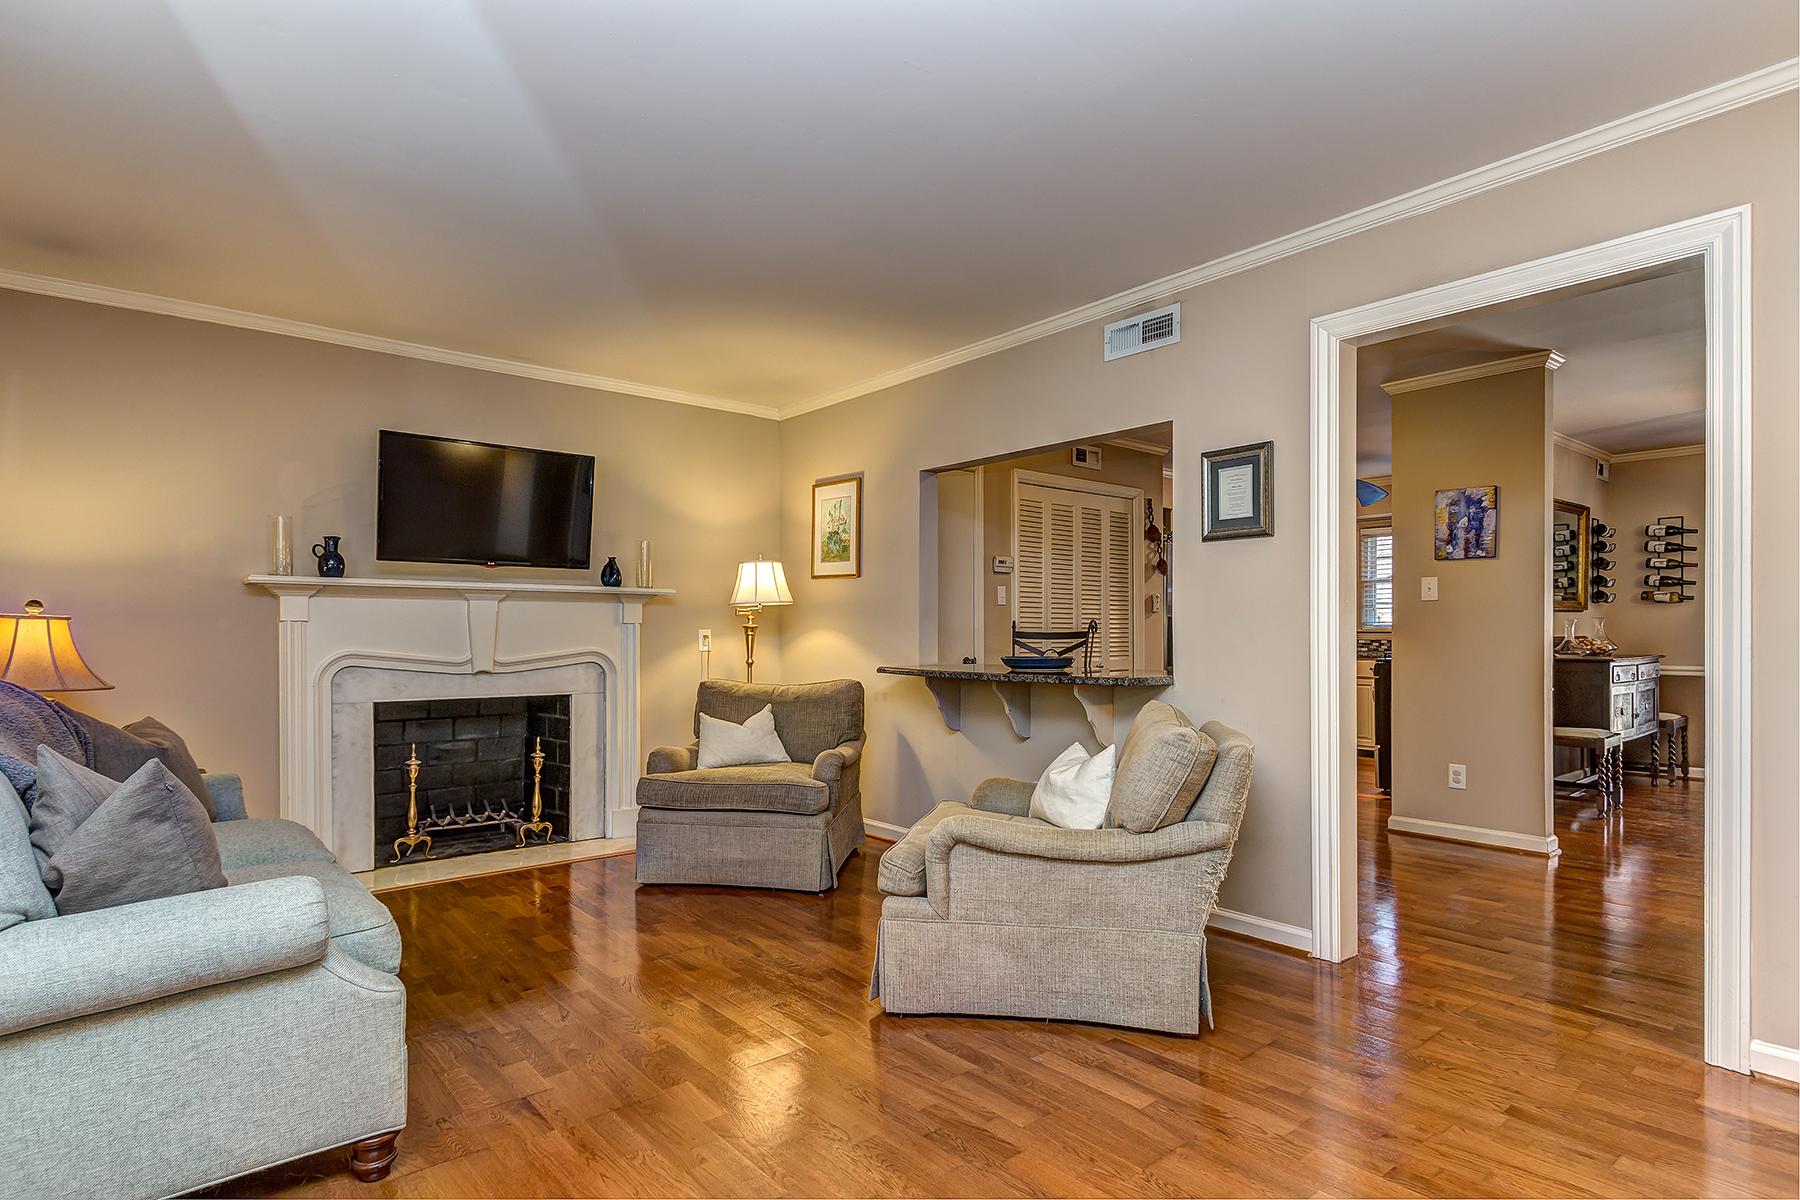 sales property at 1700 Roxborough Rd , Charlotte, NC 28211